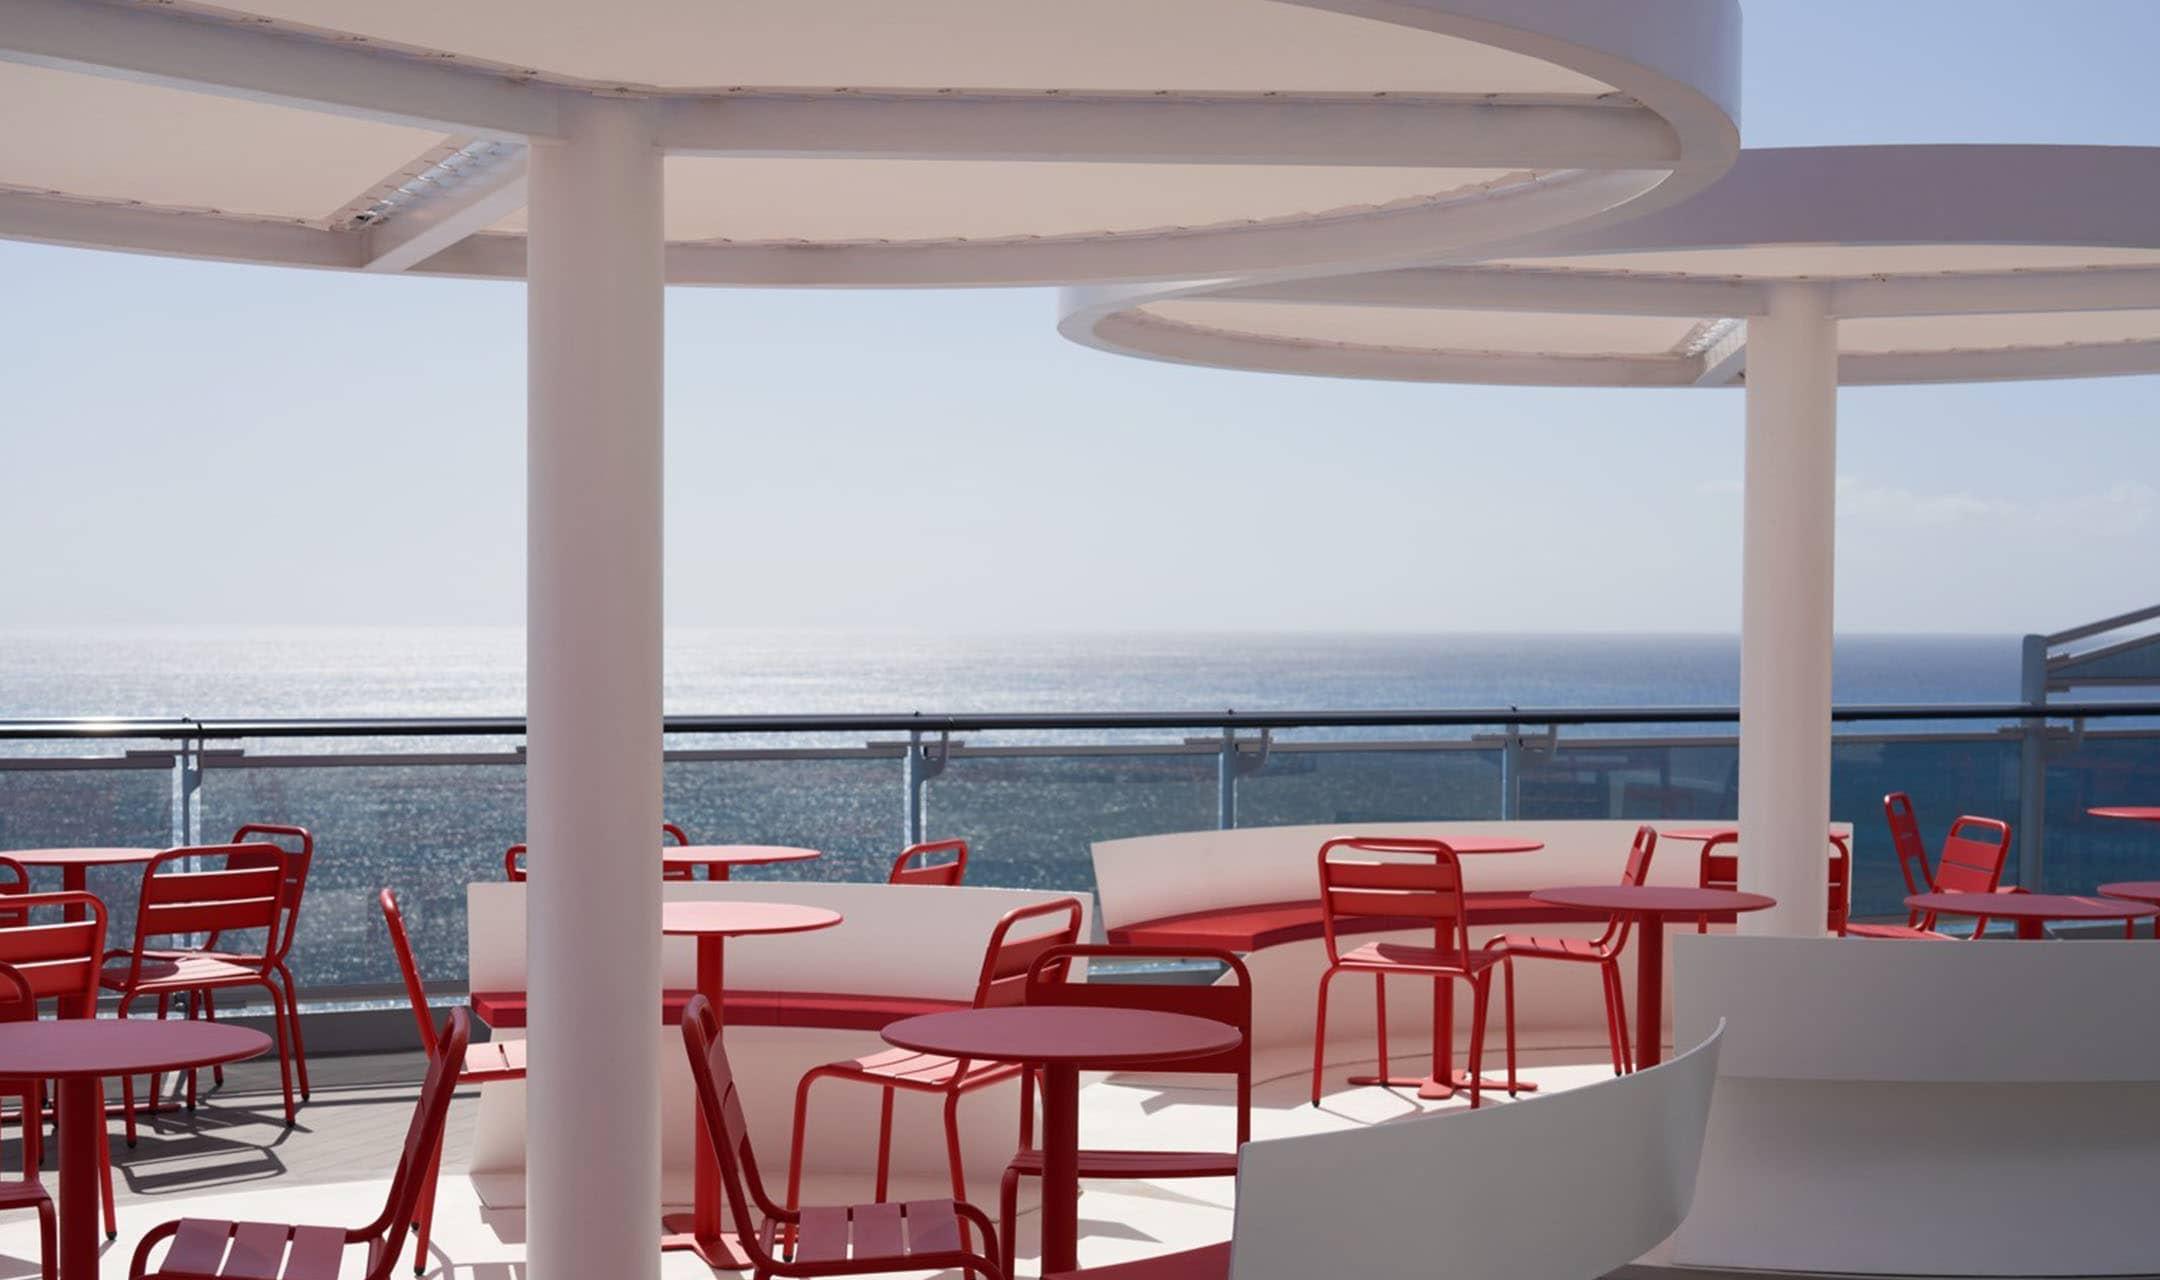 Virgin Voyages Valiant Lady Cruise Ship